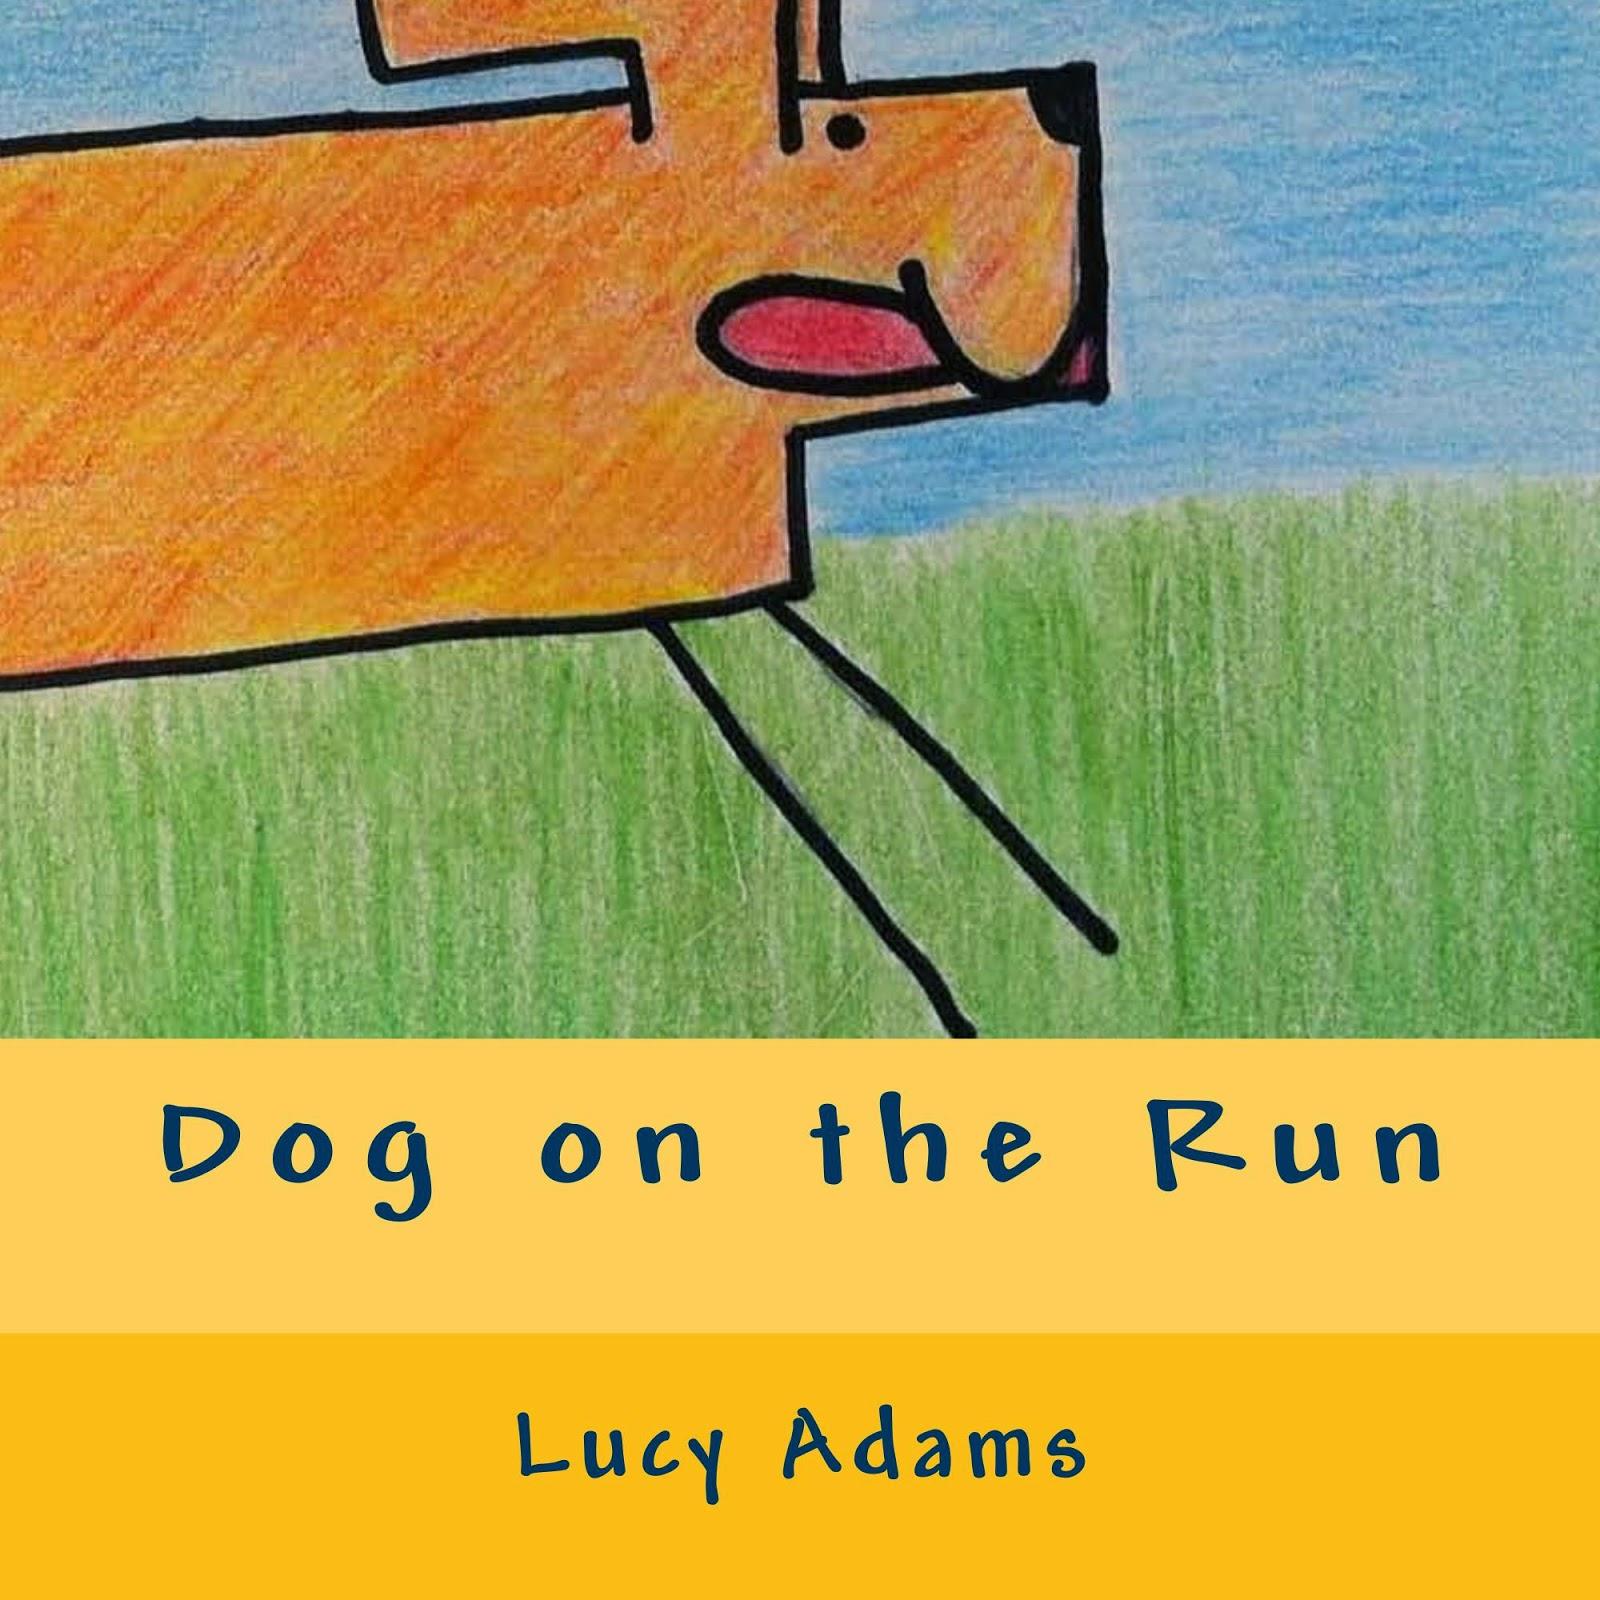 http://www.amazon.com/Dog-Run-Lucy-Adams/dp/1500671215/ref=sr_sp-atf_title_1_13?s=books&ie=UTF8&qid=undefined&sr=1-13&keywords=dog+on+the+run